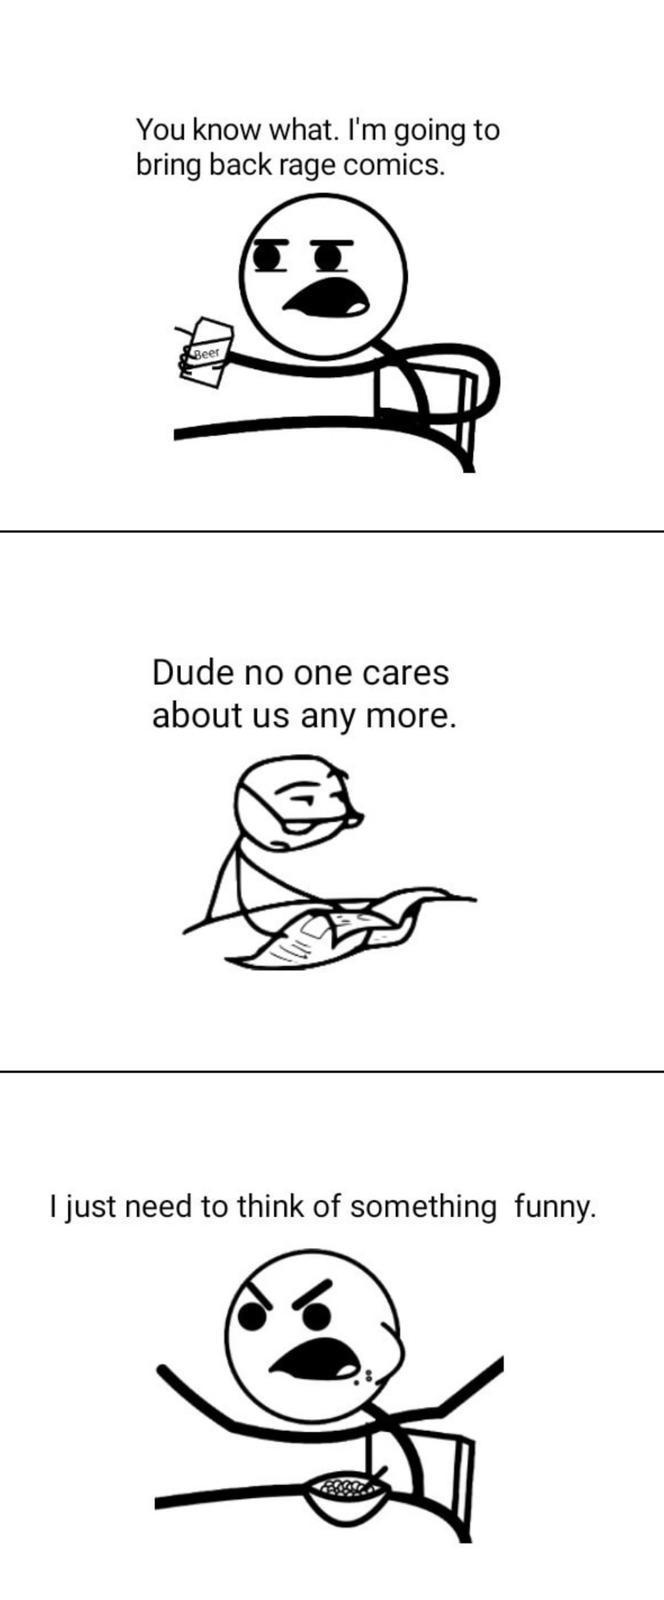 Bring back rage comics - meme